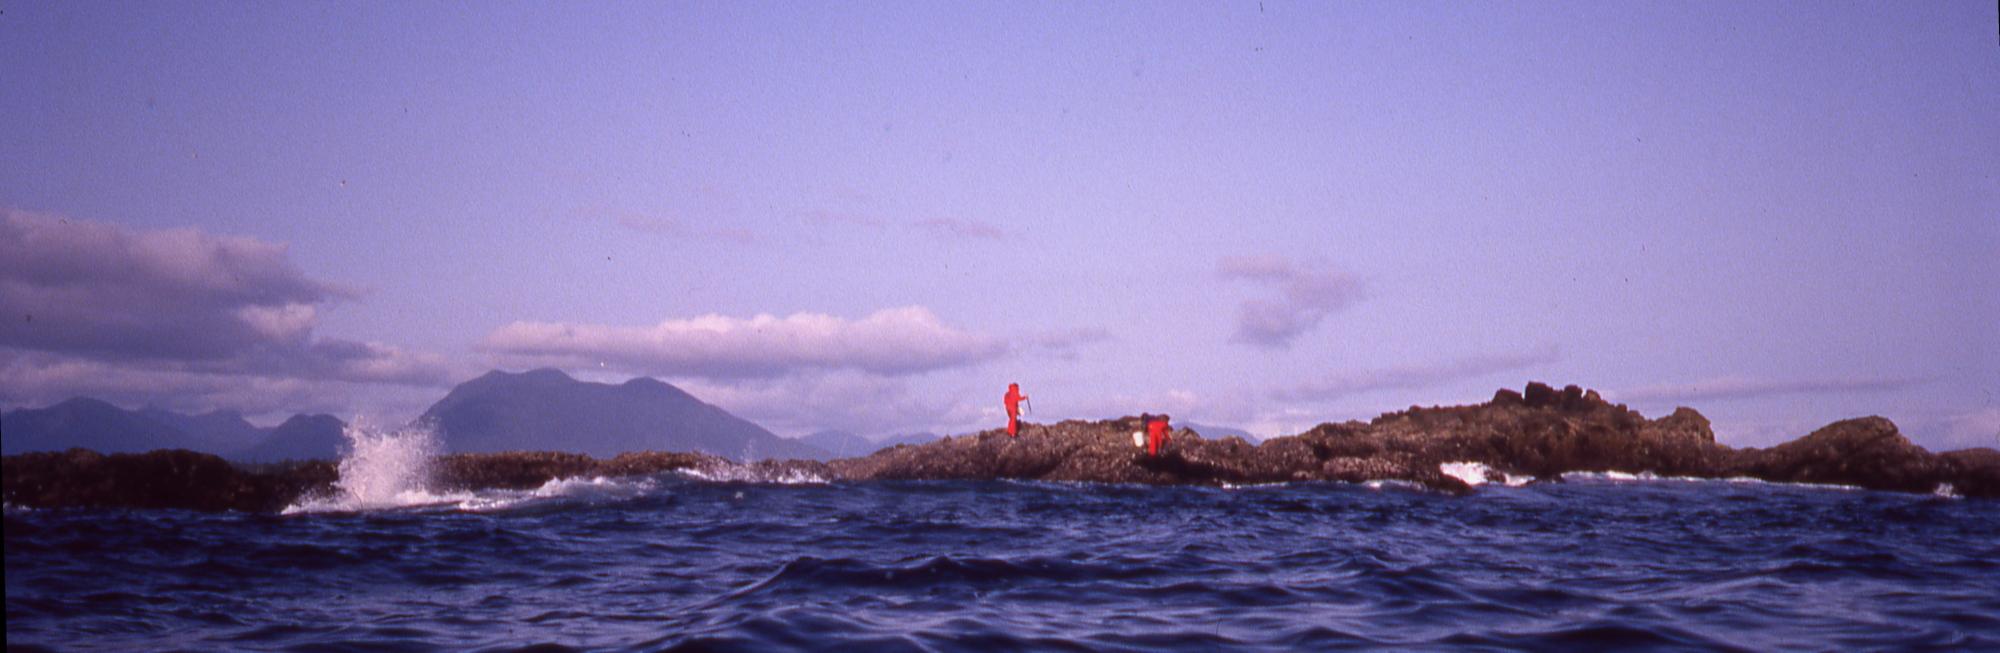 two men in red floater suits standing on Verbeke Reef in the Broken Islands group, British Columbia